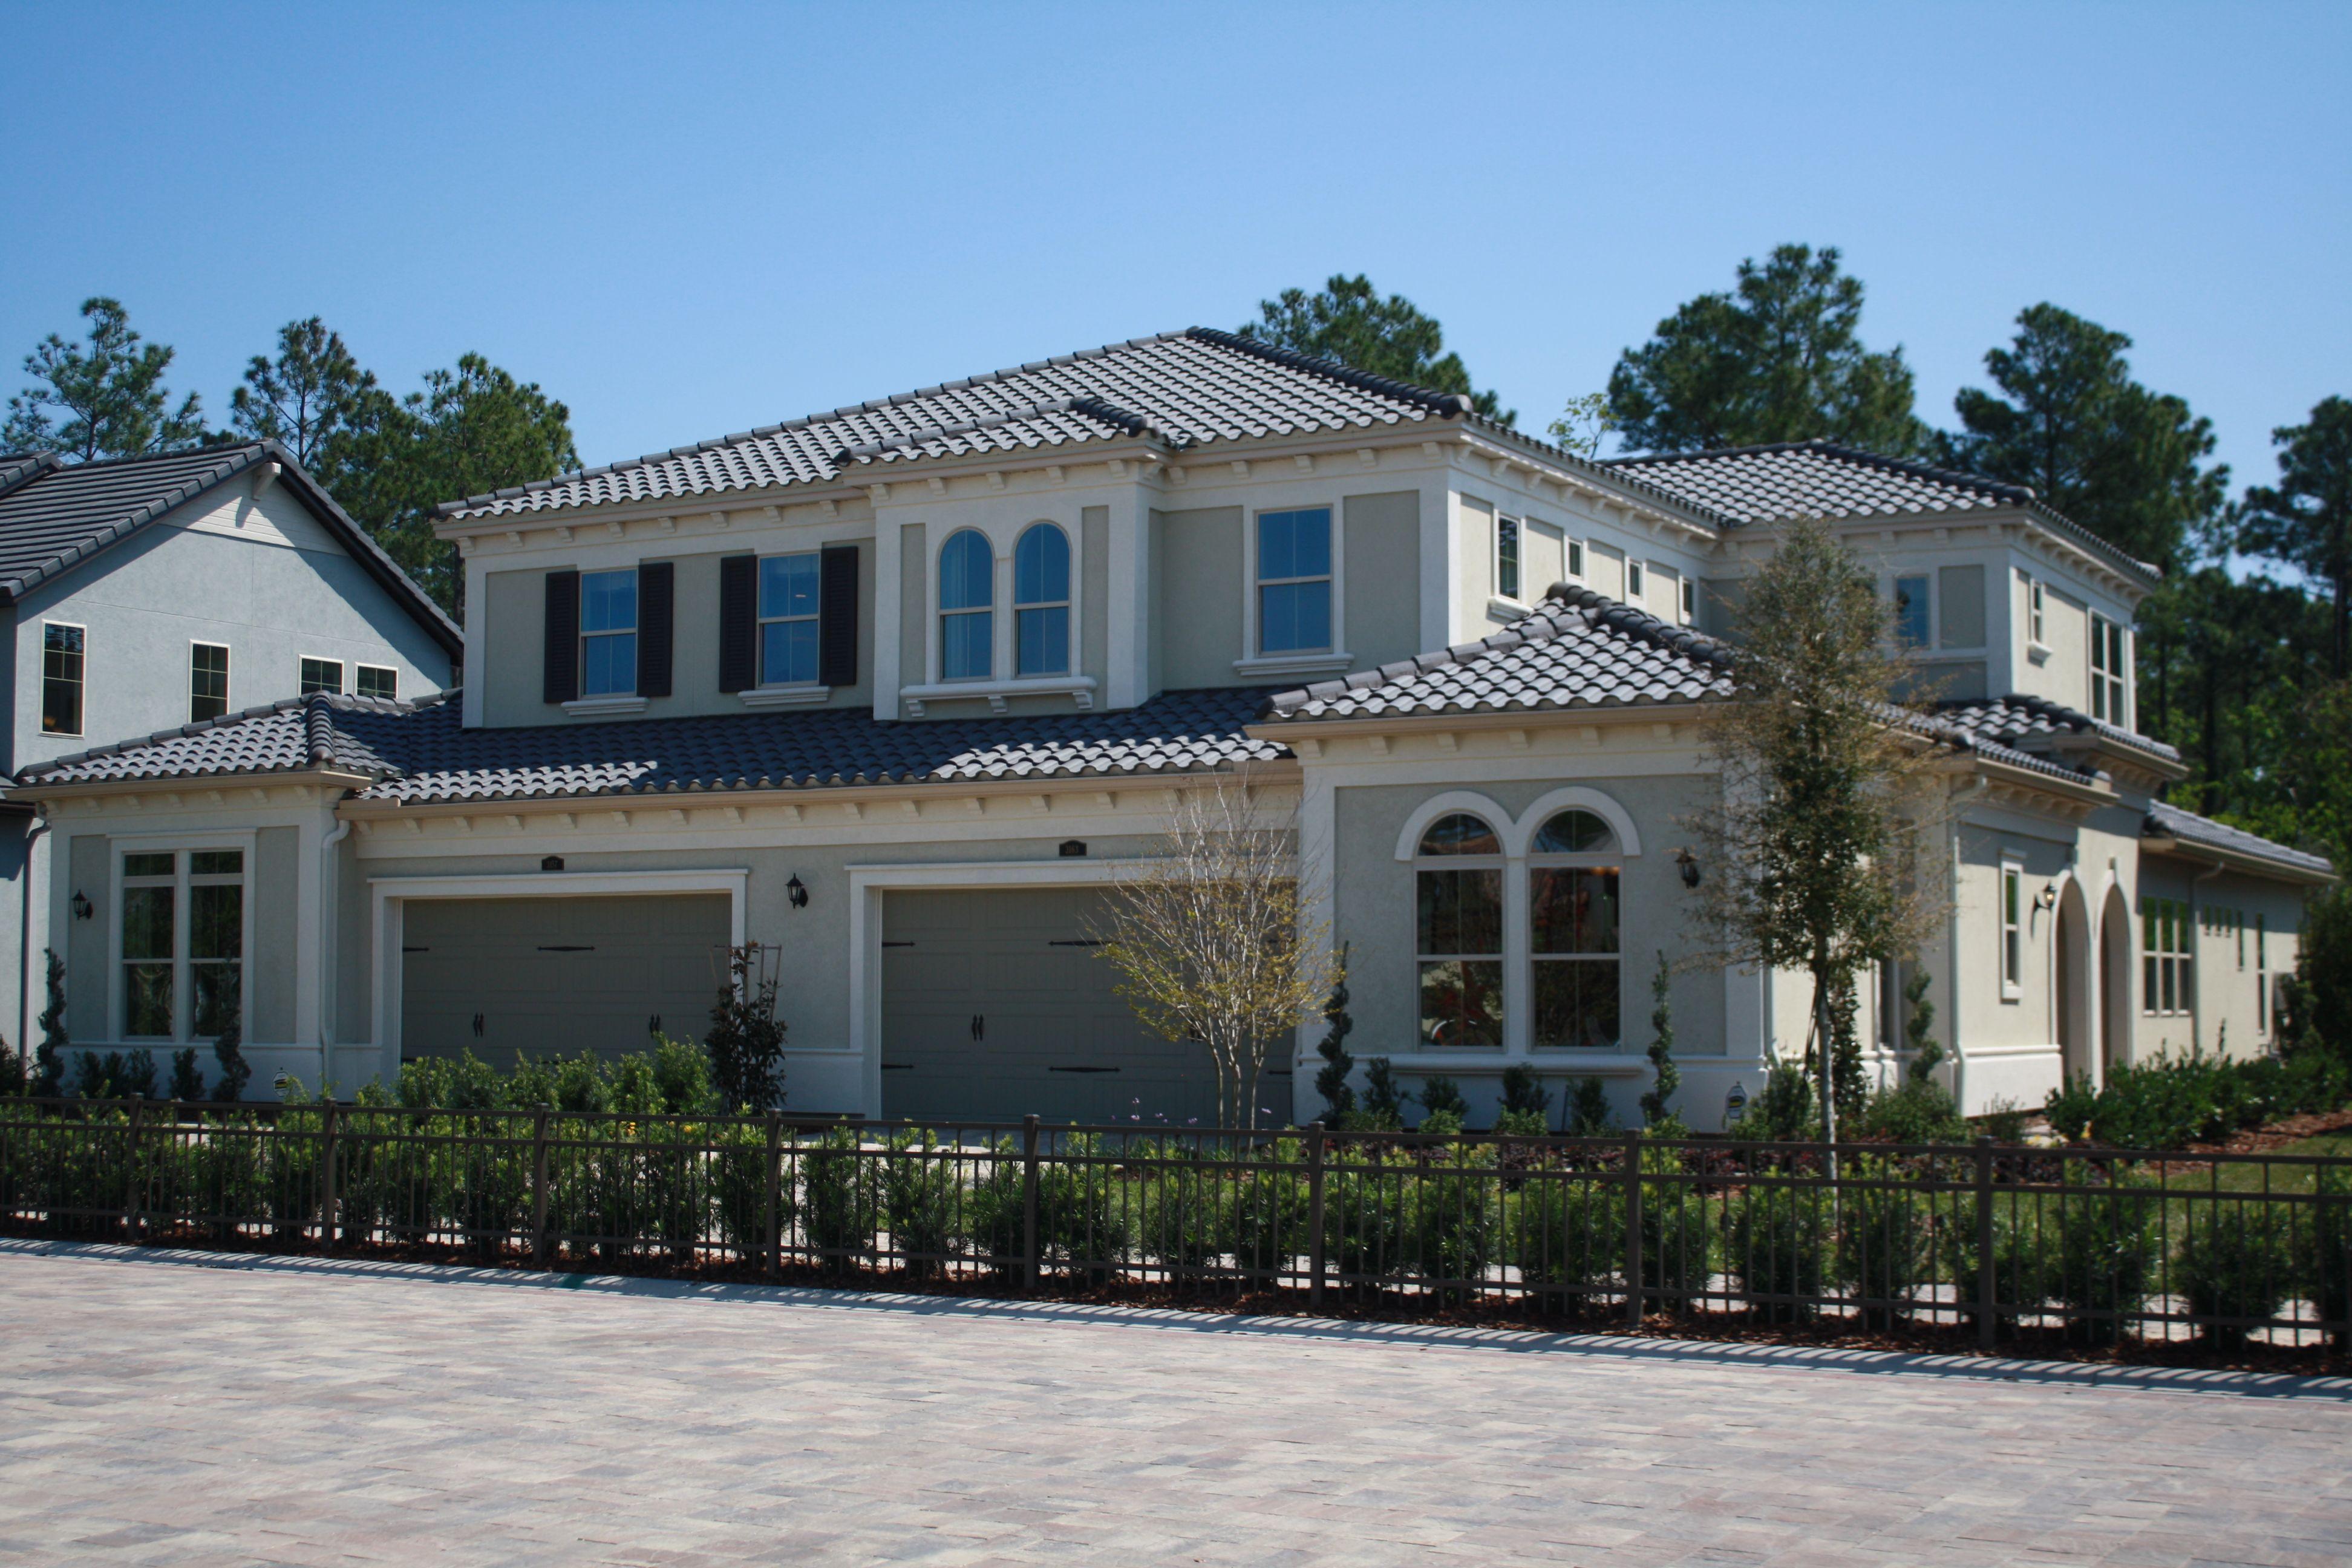 3503 Capistrano Sierra Madre Concrete Roof Tiles Roofing Mediterranean Homes